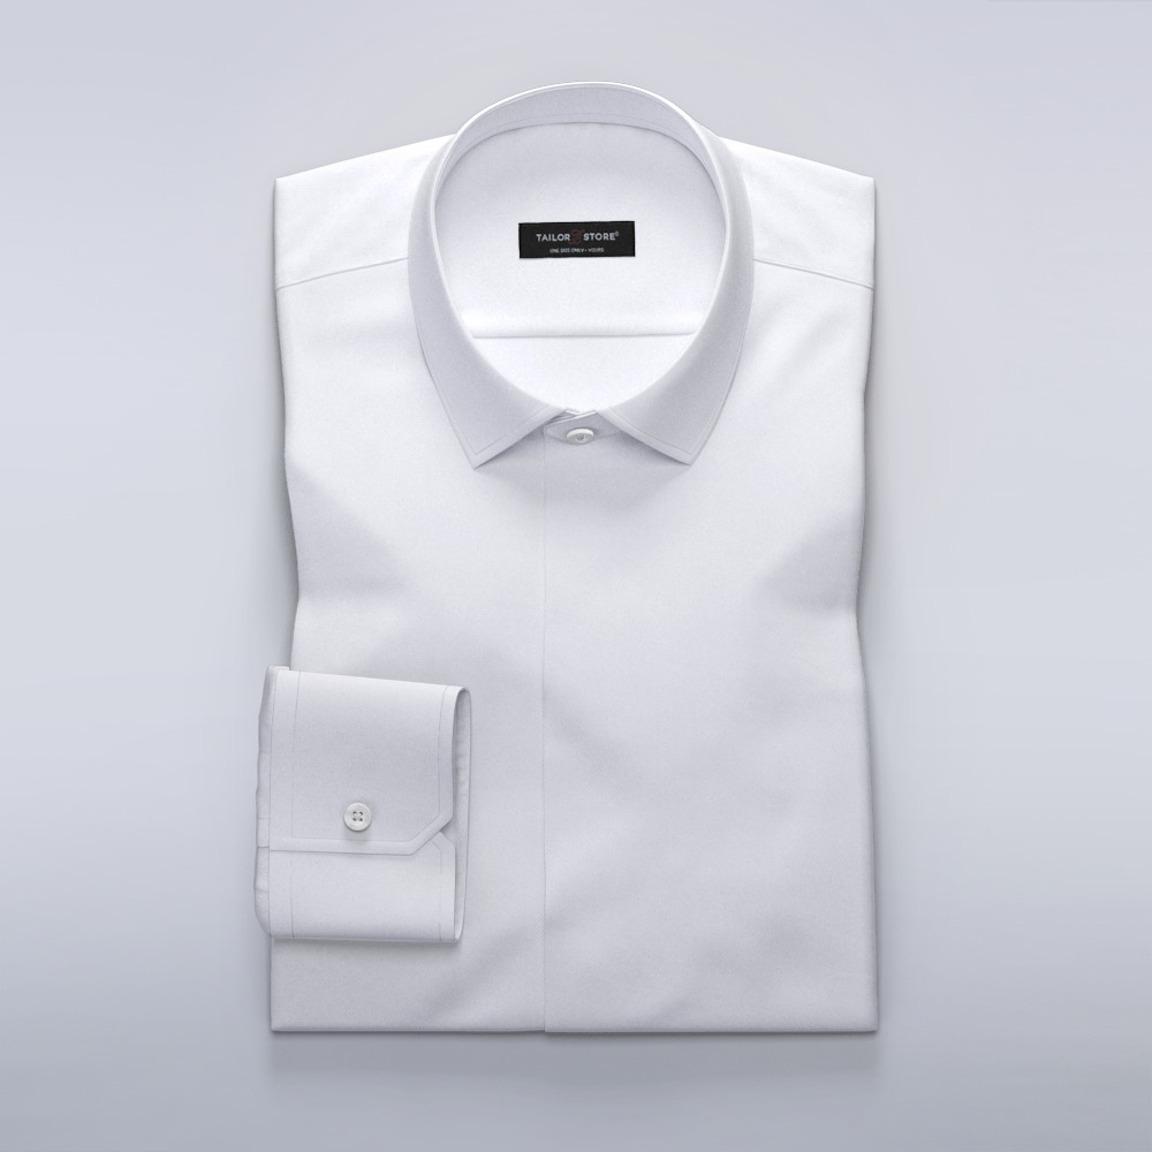 Chemise blanche business pour femmes en dobby